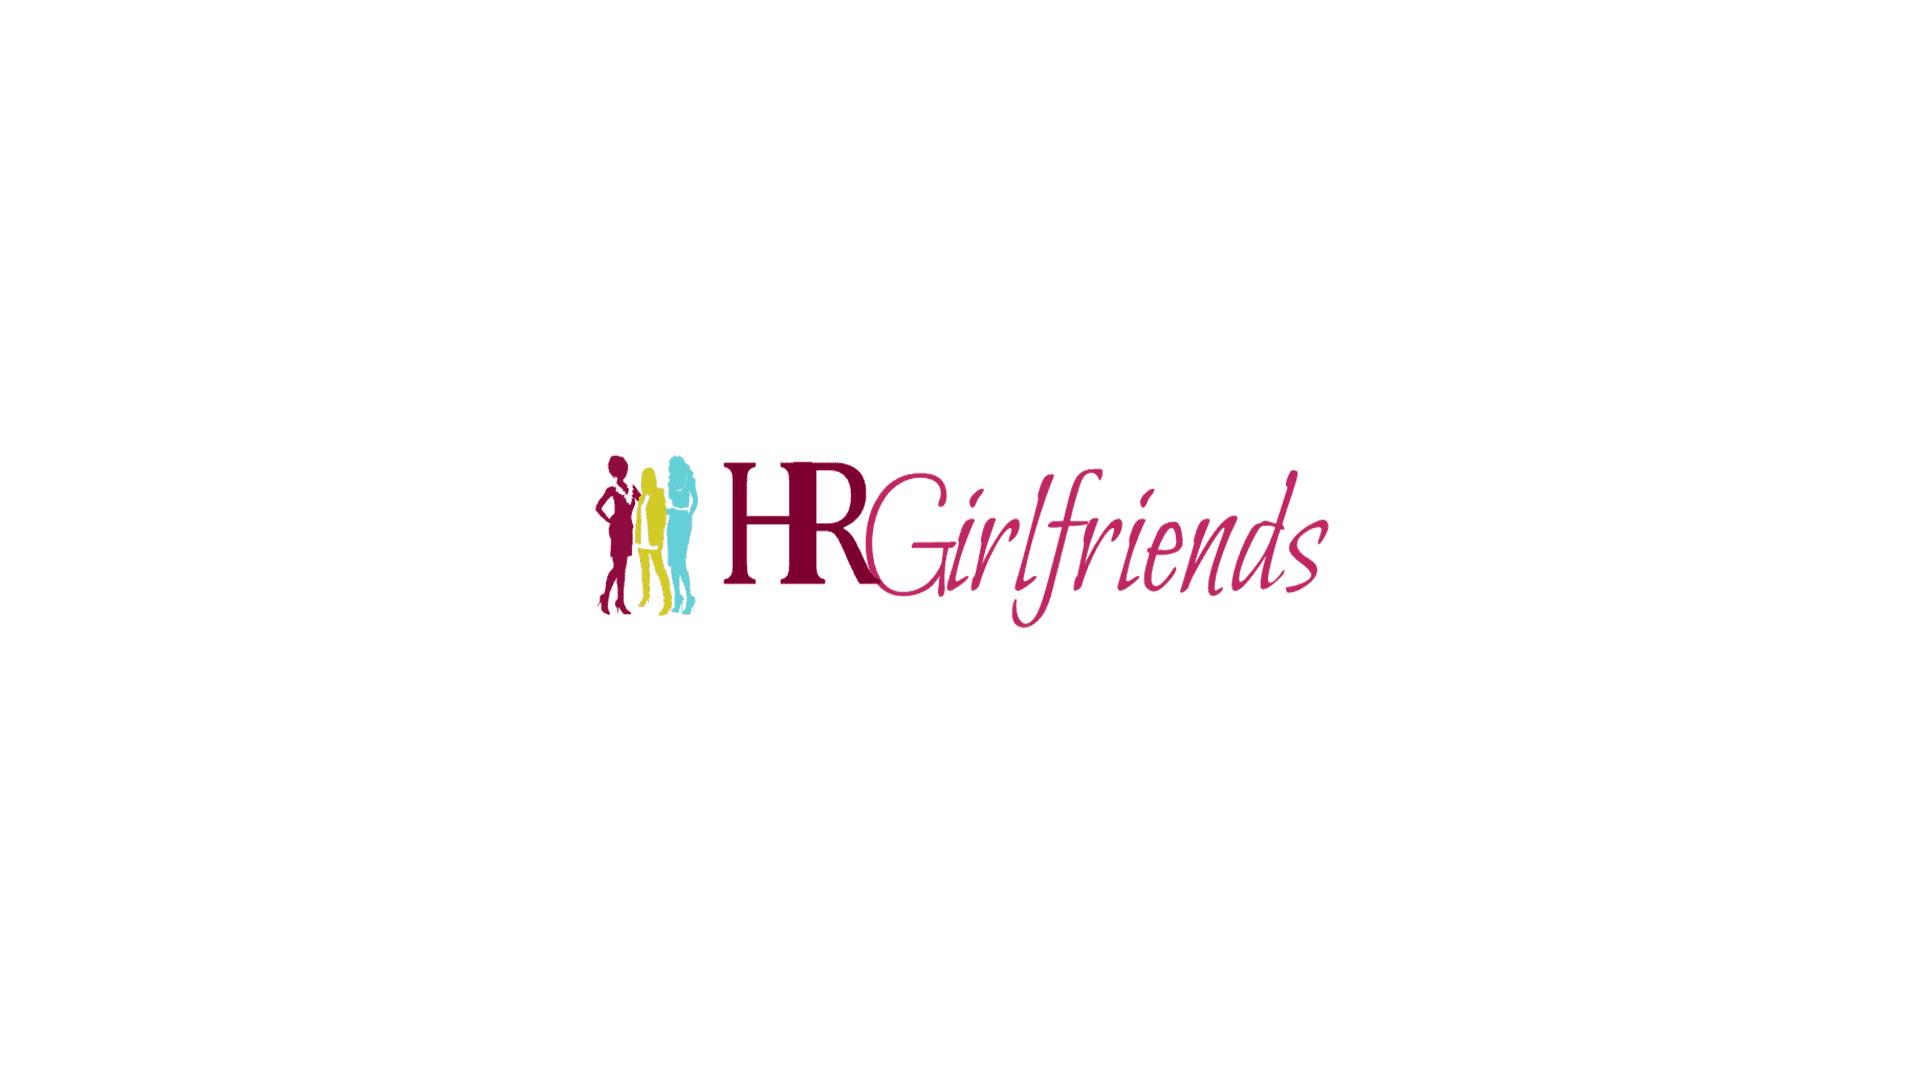 hrgf_vid_overlay_v2